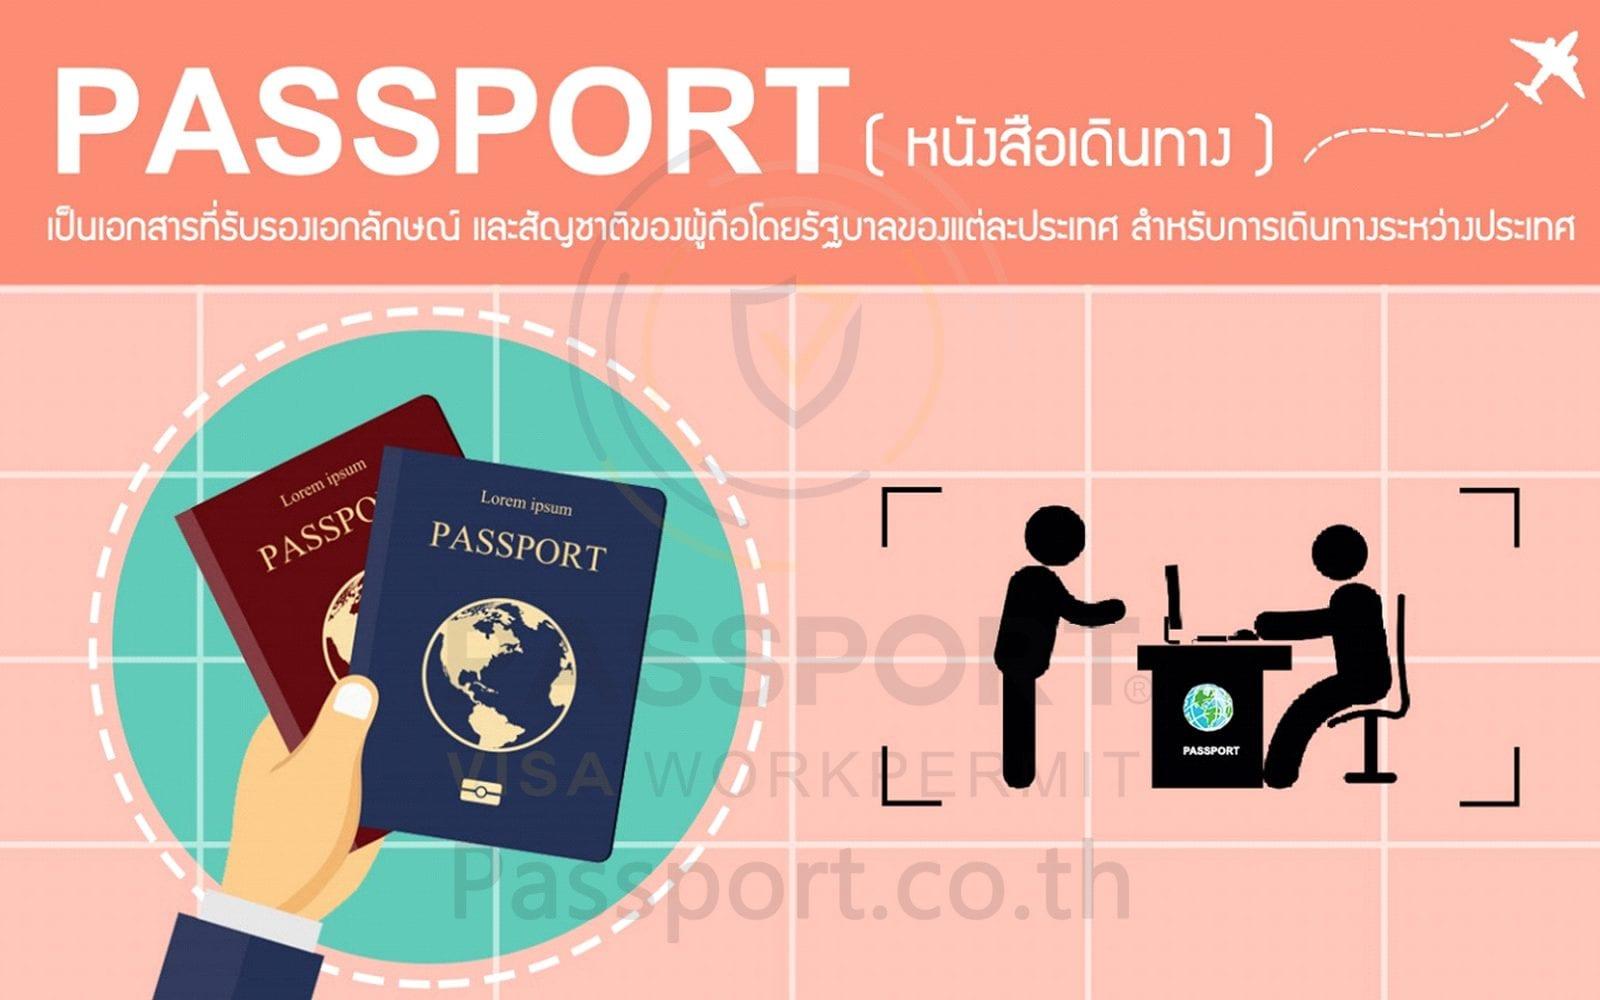 PASSPORT (หนังสือเดินทาง)